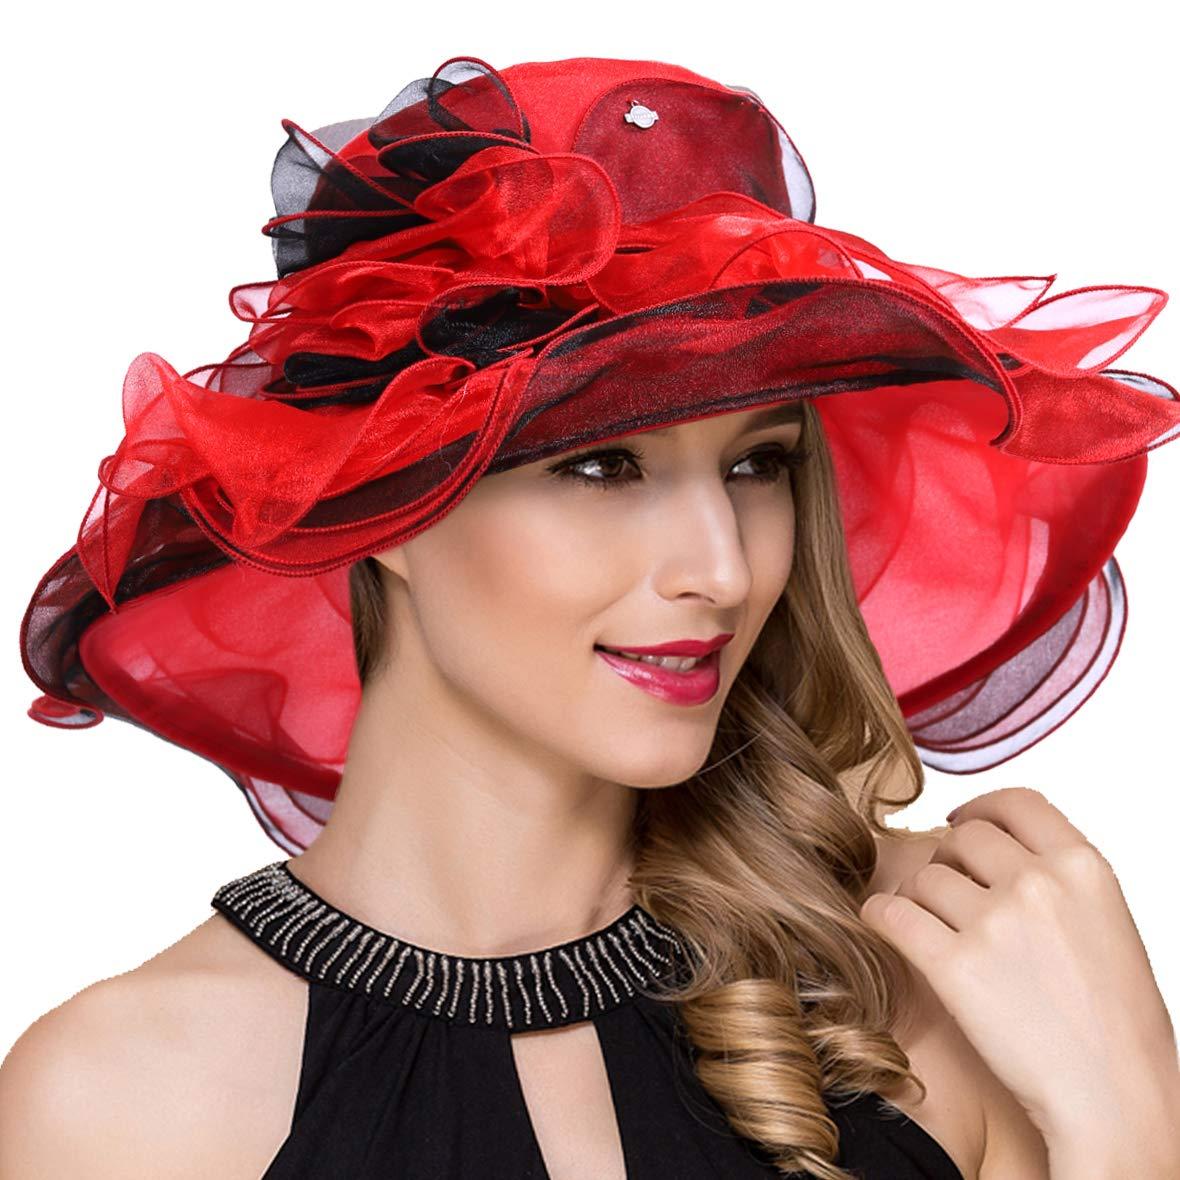 S614red Ruphedy Lady Organza Derby Church Dress Fascinator Wide Brim Bridal Wedding Tea Party Hats S056